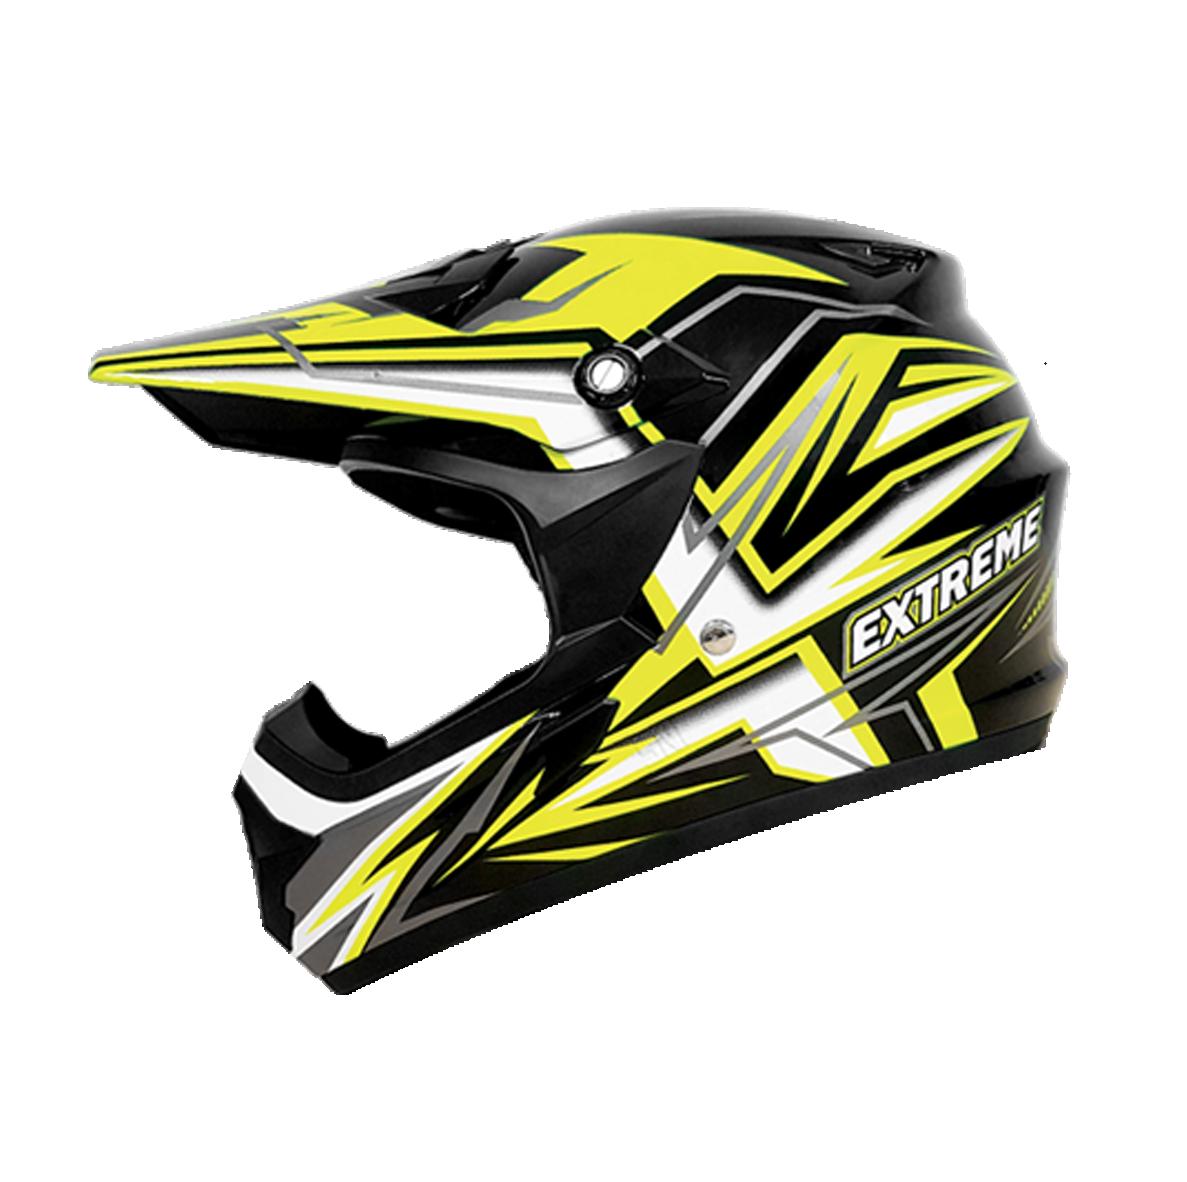 YF-N4 Rconcept White: Helm Anti Gerah Canggih dari Yamaha